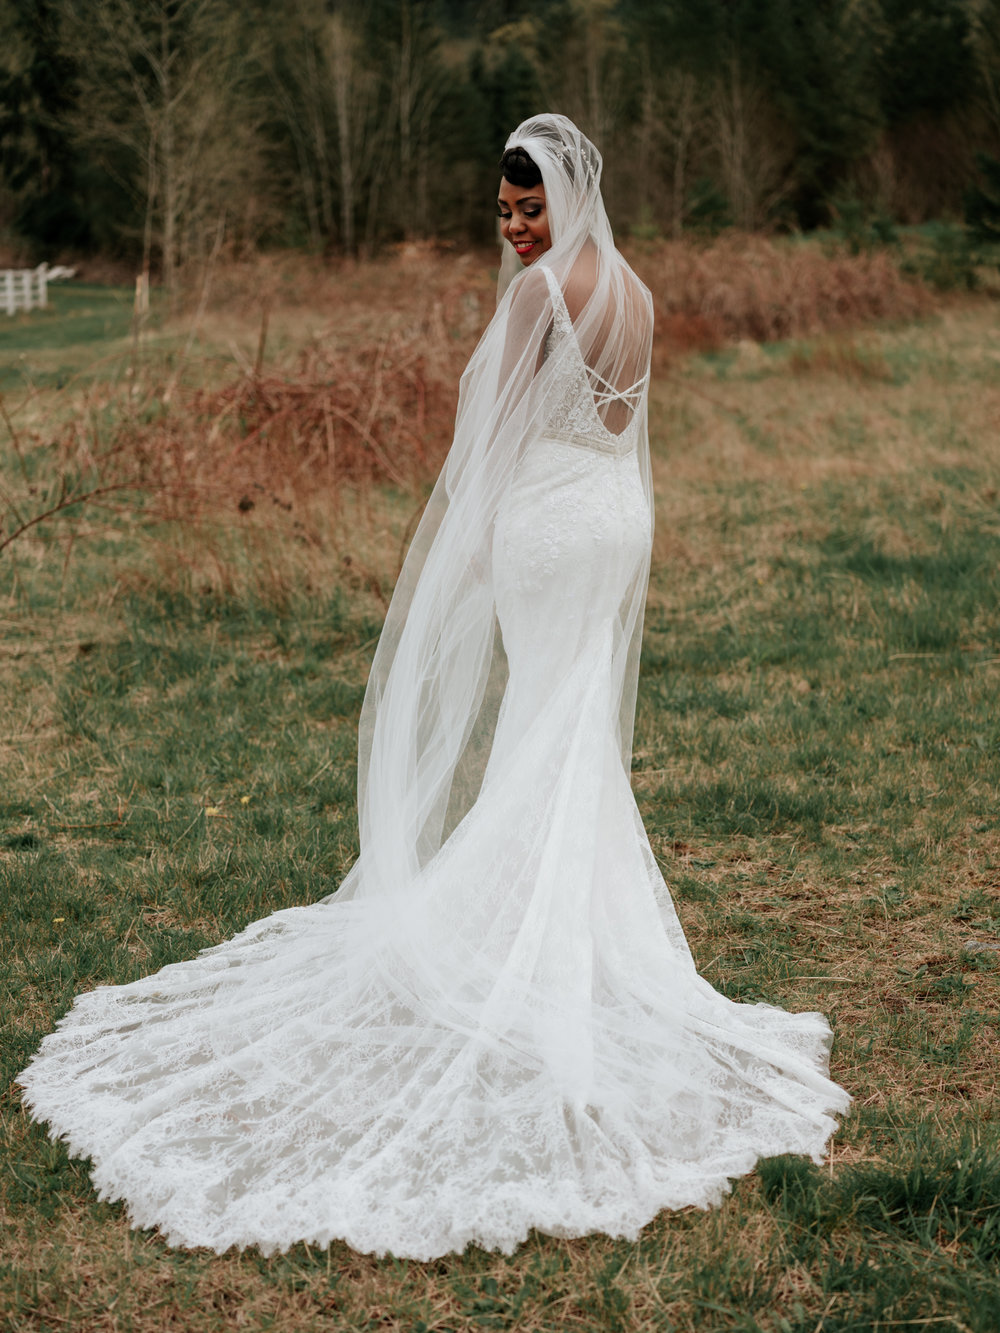 Stolen Glimpses Seattle Wedding Photographer at Rein Fire Ranch 32.jpg